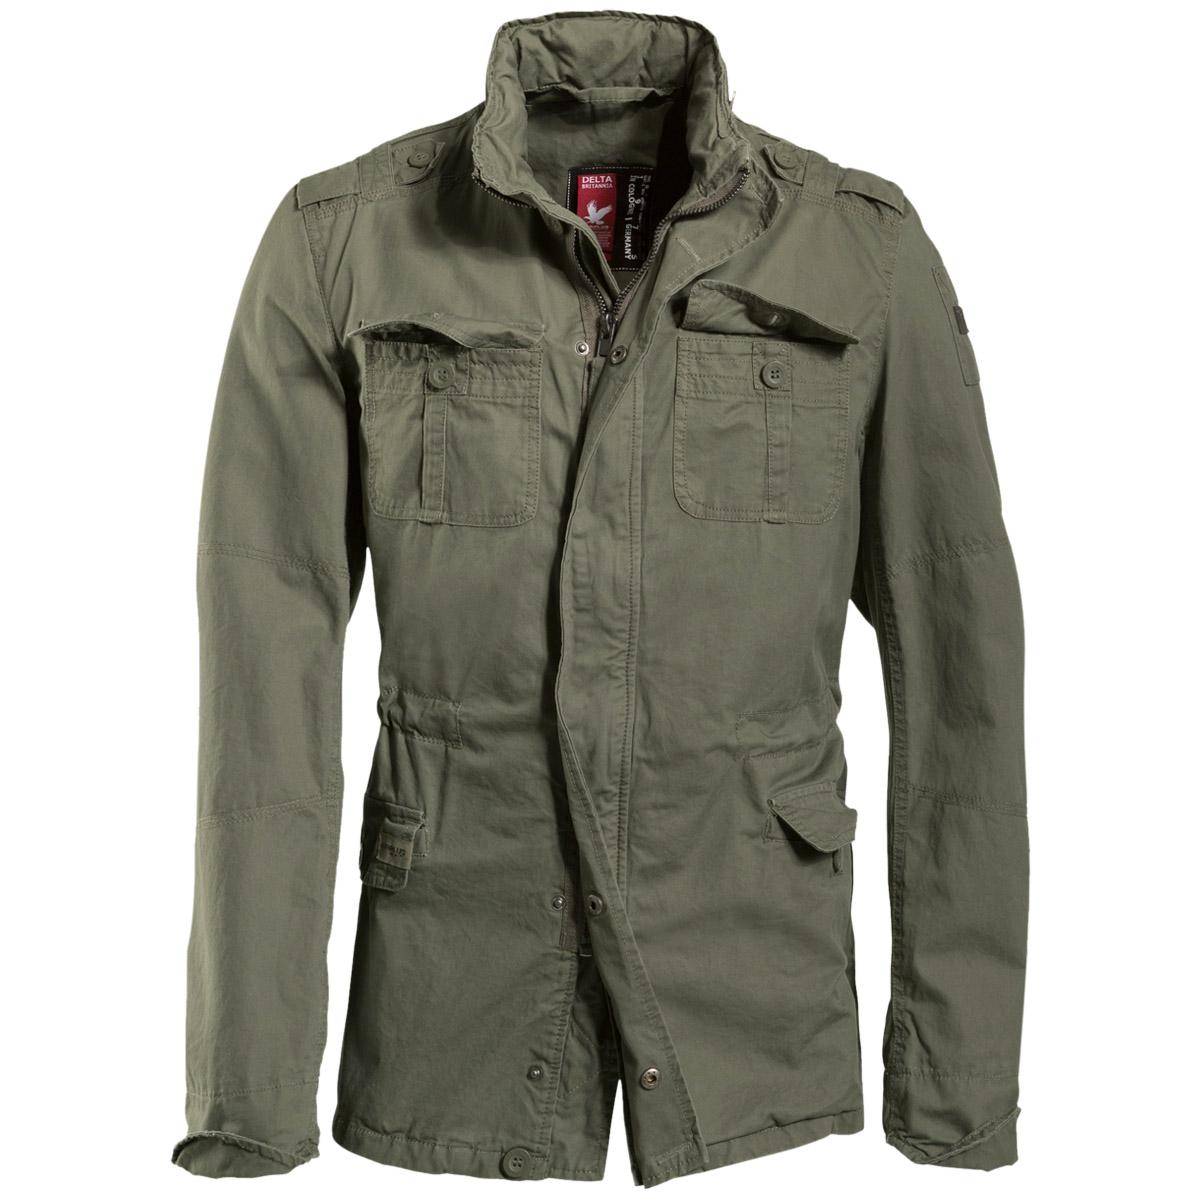 surplus delta britannia jacket military coat army combat. Black Bedroom Furniture Sets. Home Design Ideas